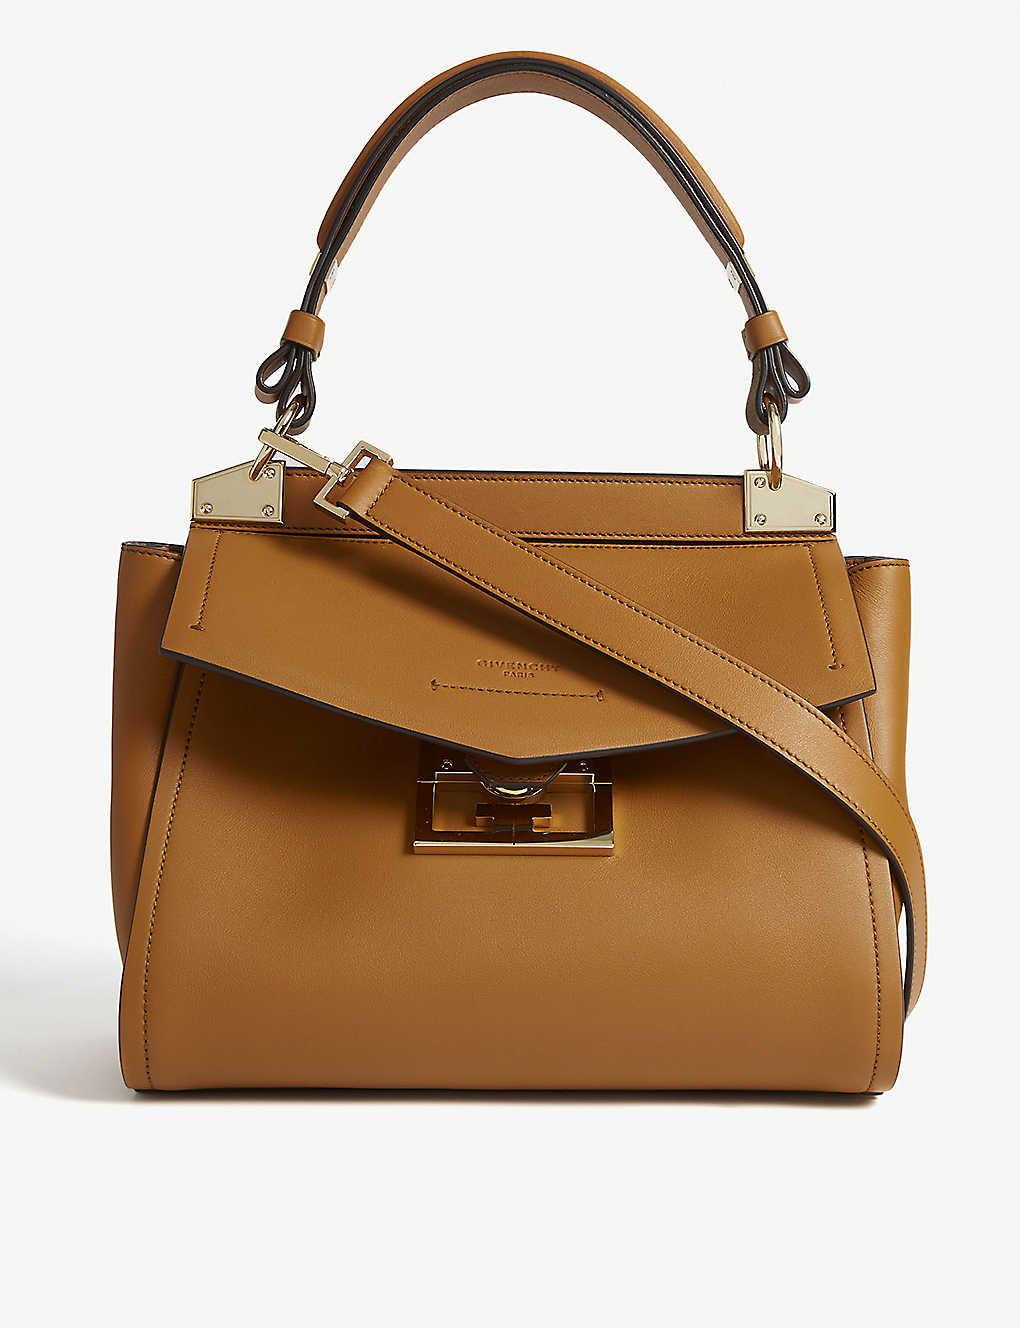 4be24ed4de1 GIVENCHY - Mystic small leather top handle bag | Selfridges.com